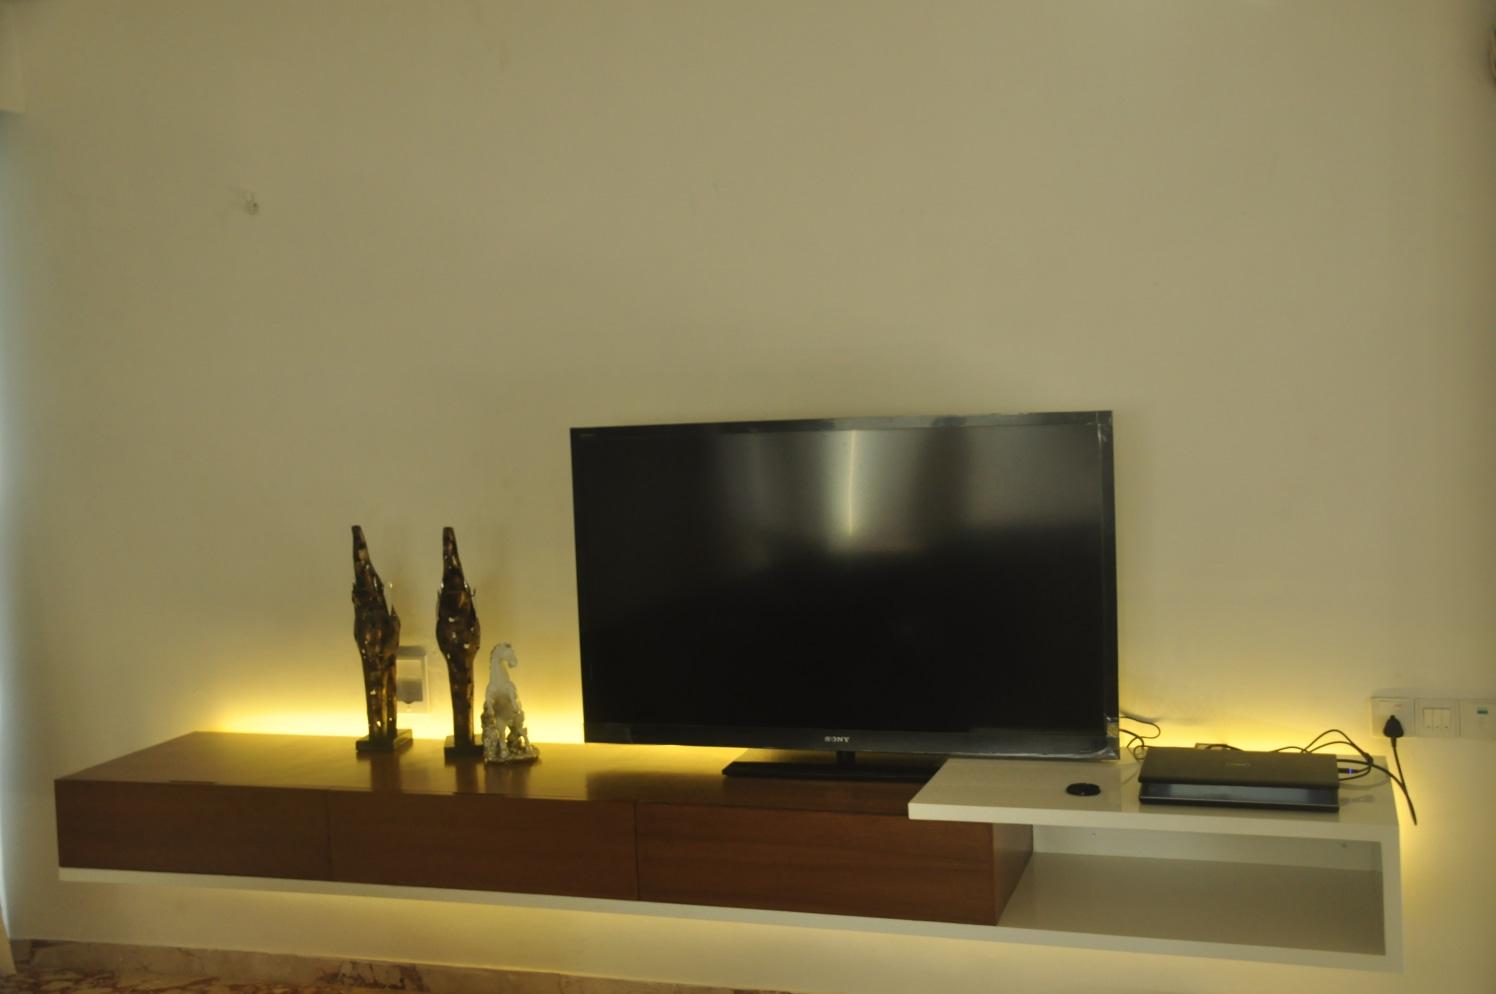 Modern TV Set by Deepti Srivastava Bedroom Contemporary | Interior Design Photos & Ideas